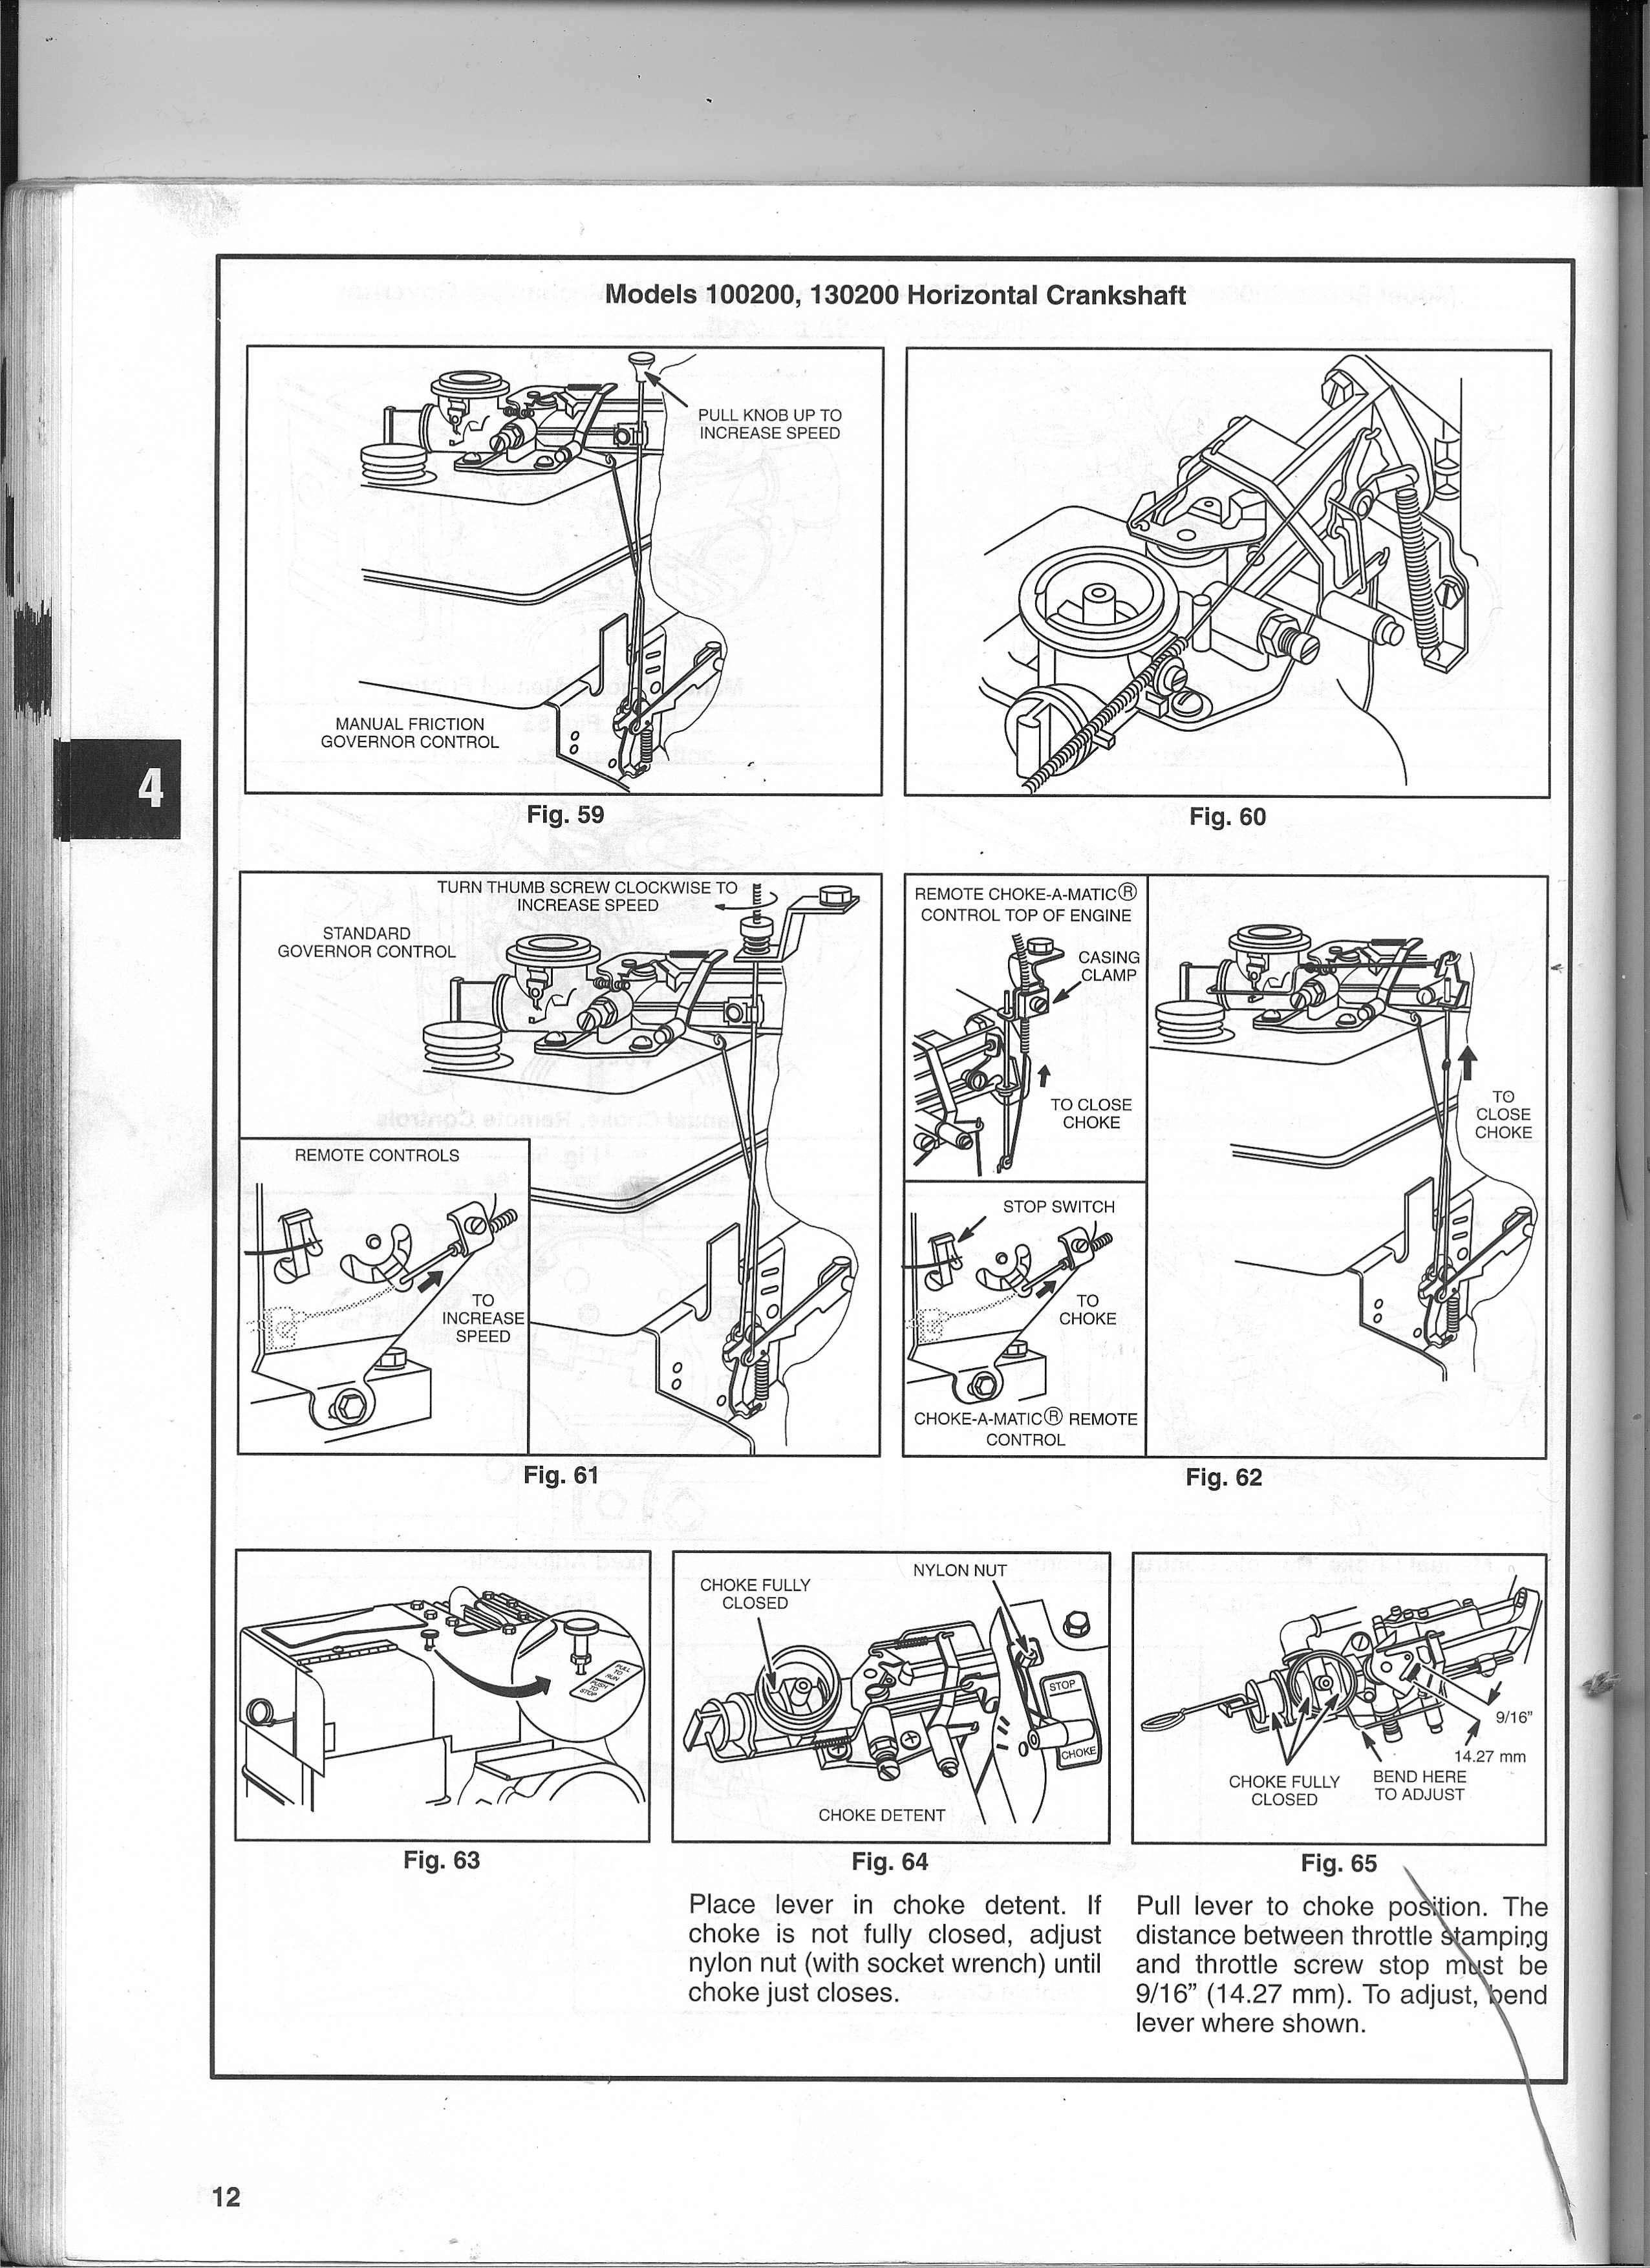 troy bilt engine wiring diagram oa 7691  troy bilt pony wiring diagram together with snapper lawn  oa 7691  troy bilt pony wiring diagram